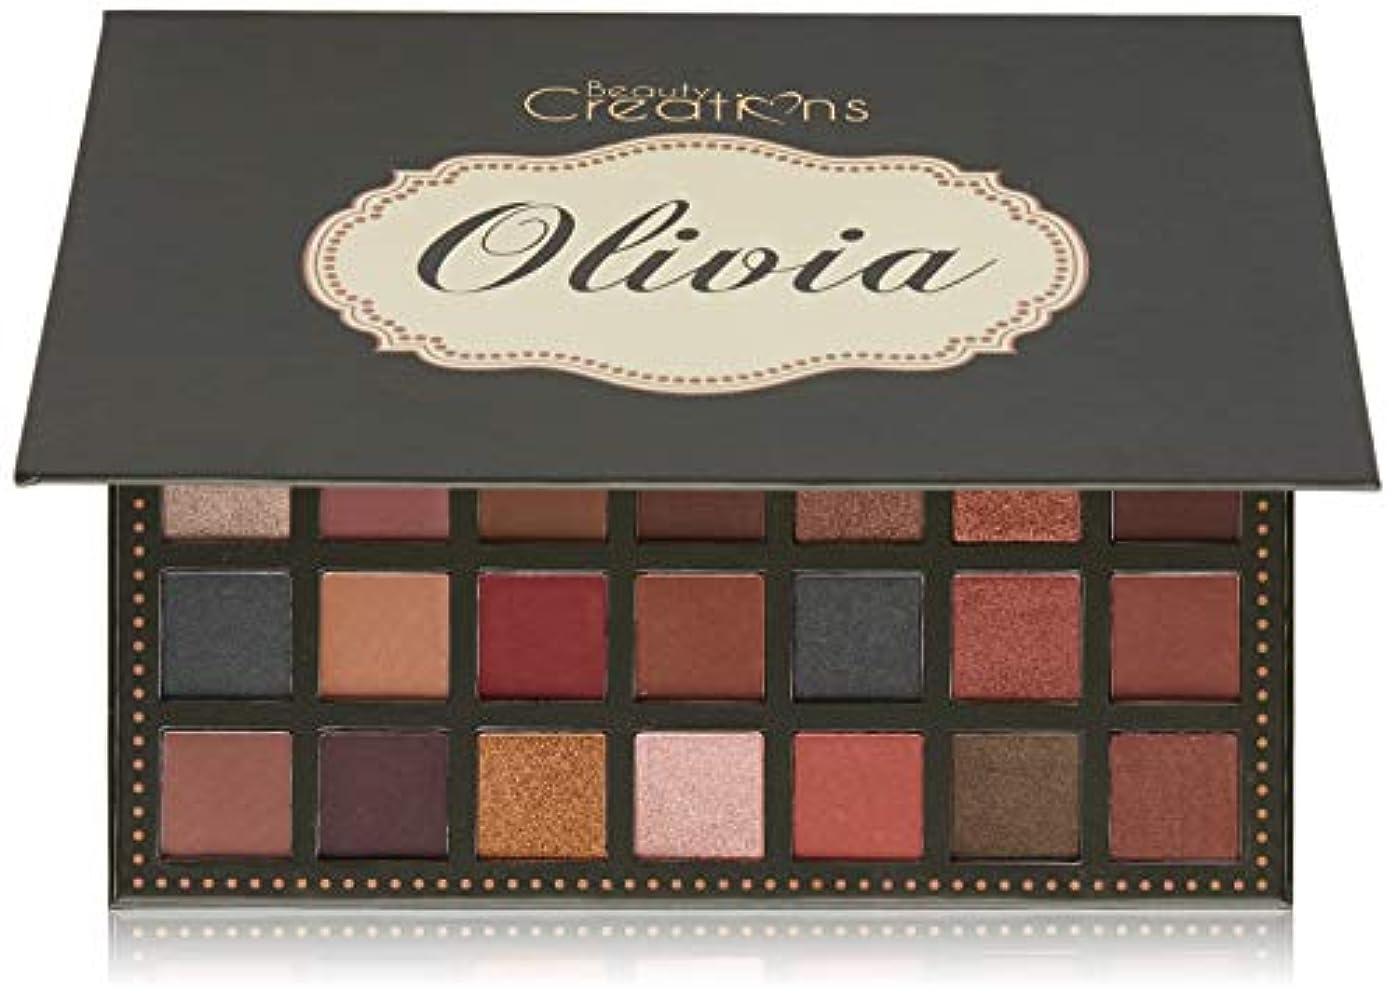 BEAUTY CREATIONS 35 Color Palette - Olivia (並行輸入品)